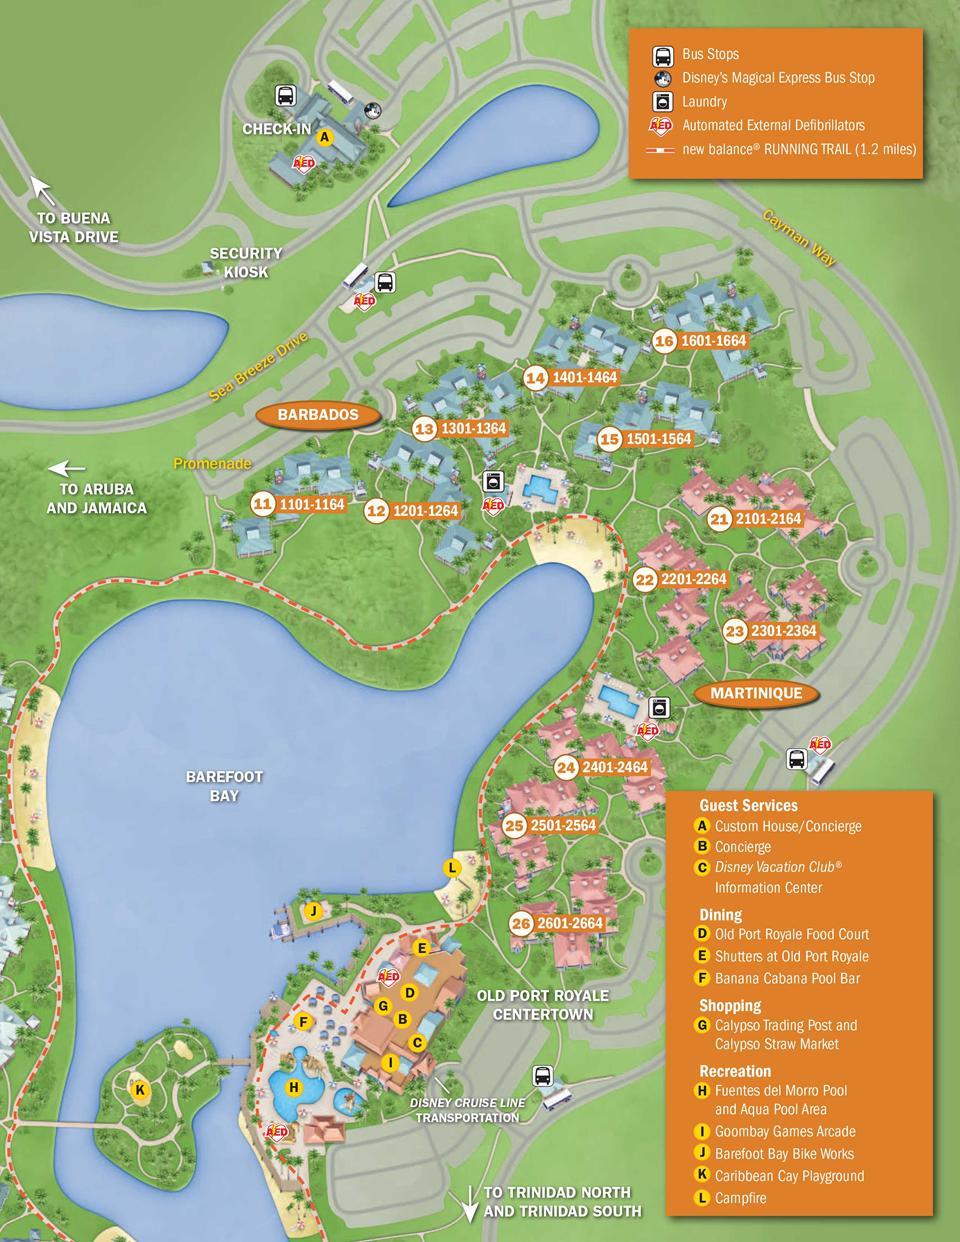 April 2017 Walt Disney World Resort Hotel Maps  Photo 16 of 33